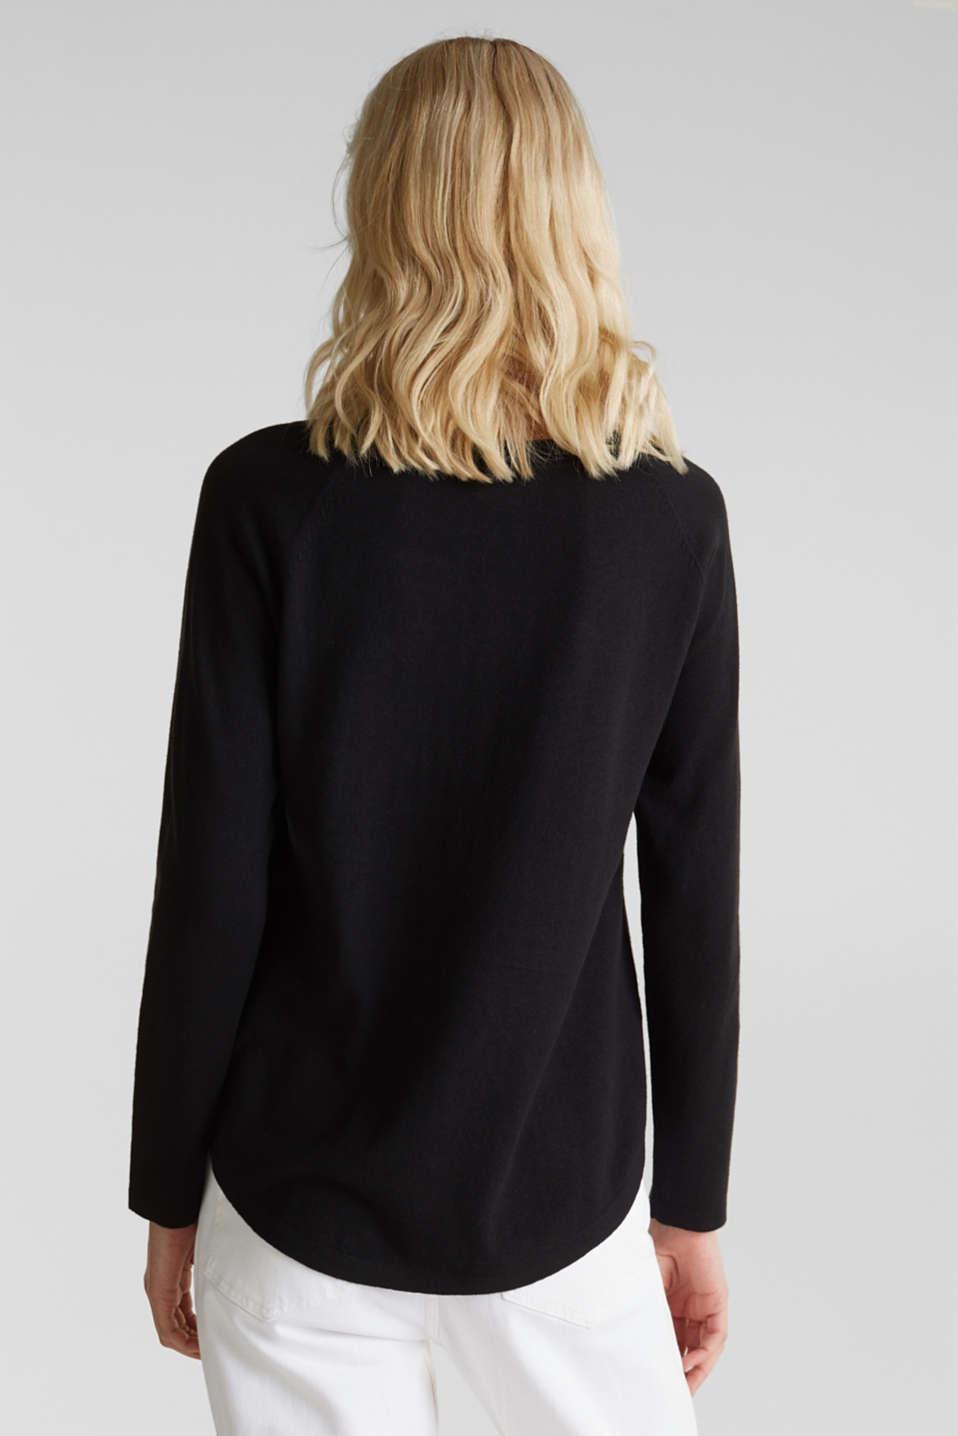 With linen: Jumper with open-work patterned details, BLACK, detail image number 2